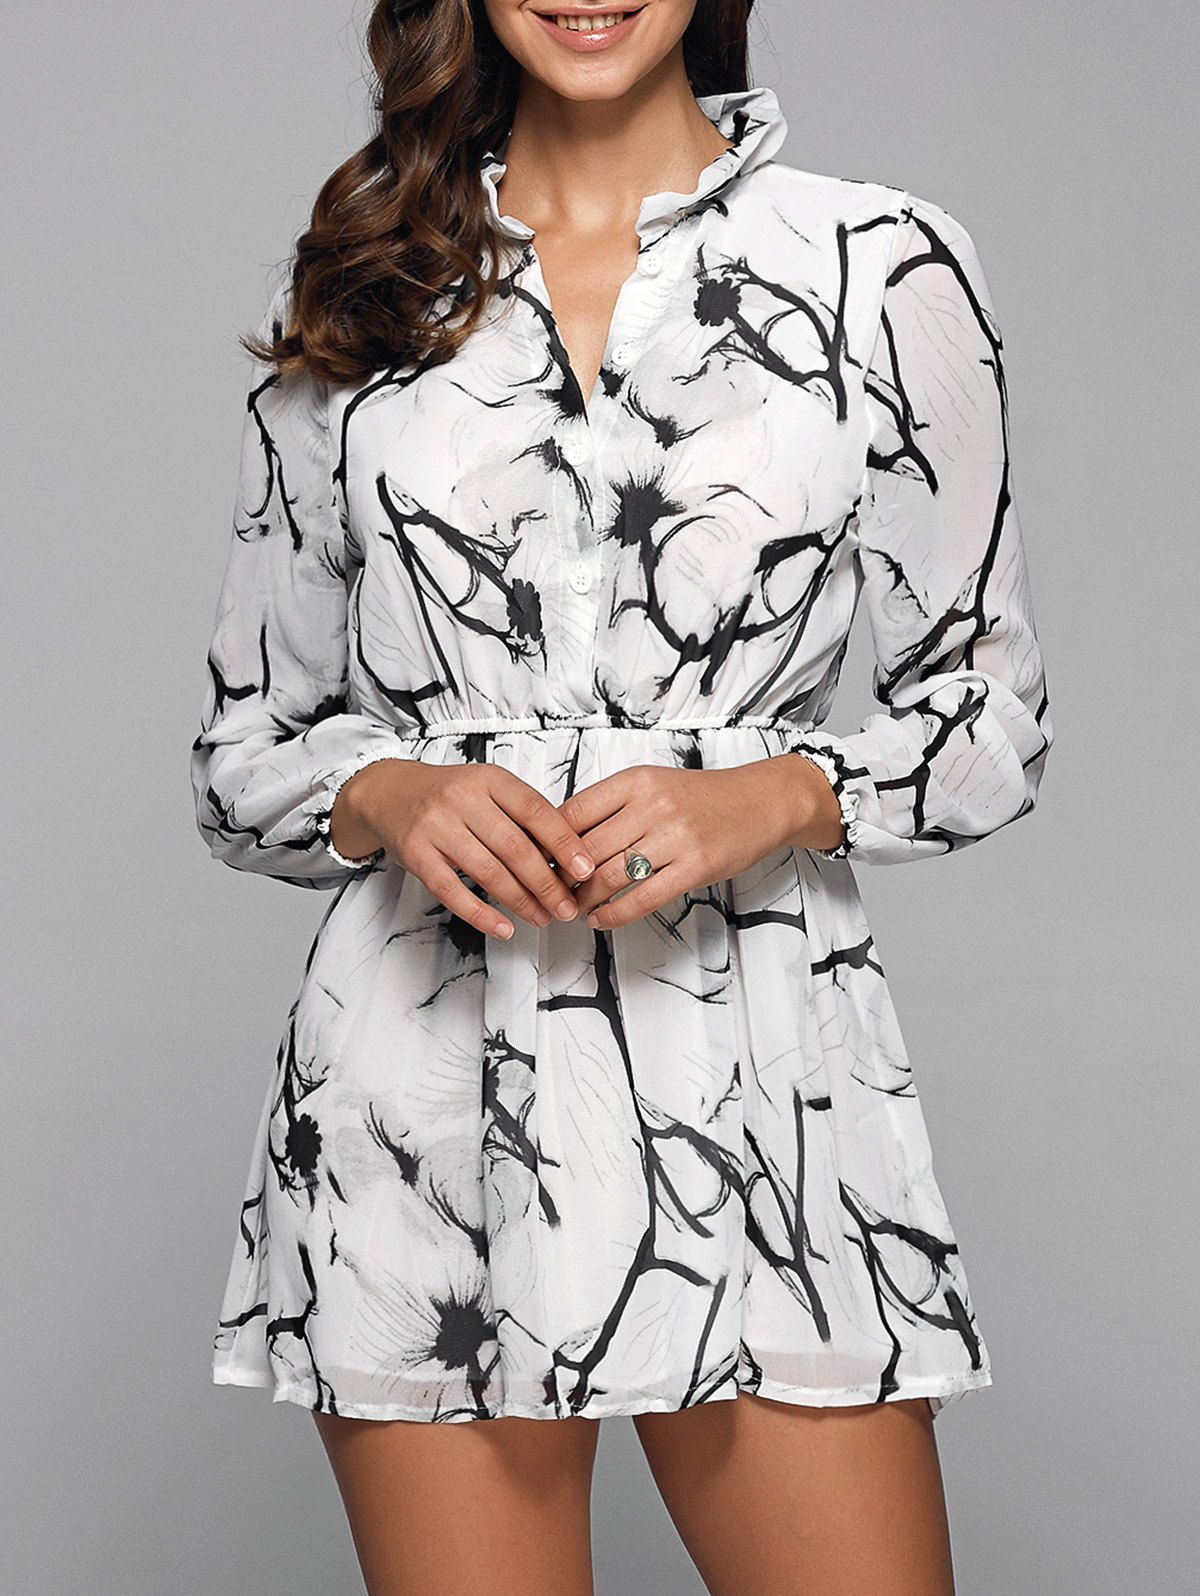 Chinese Painting Print Dress